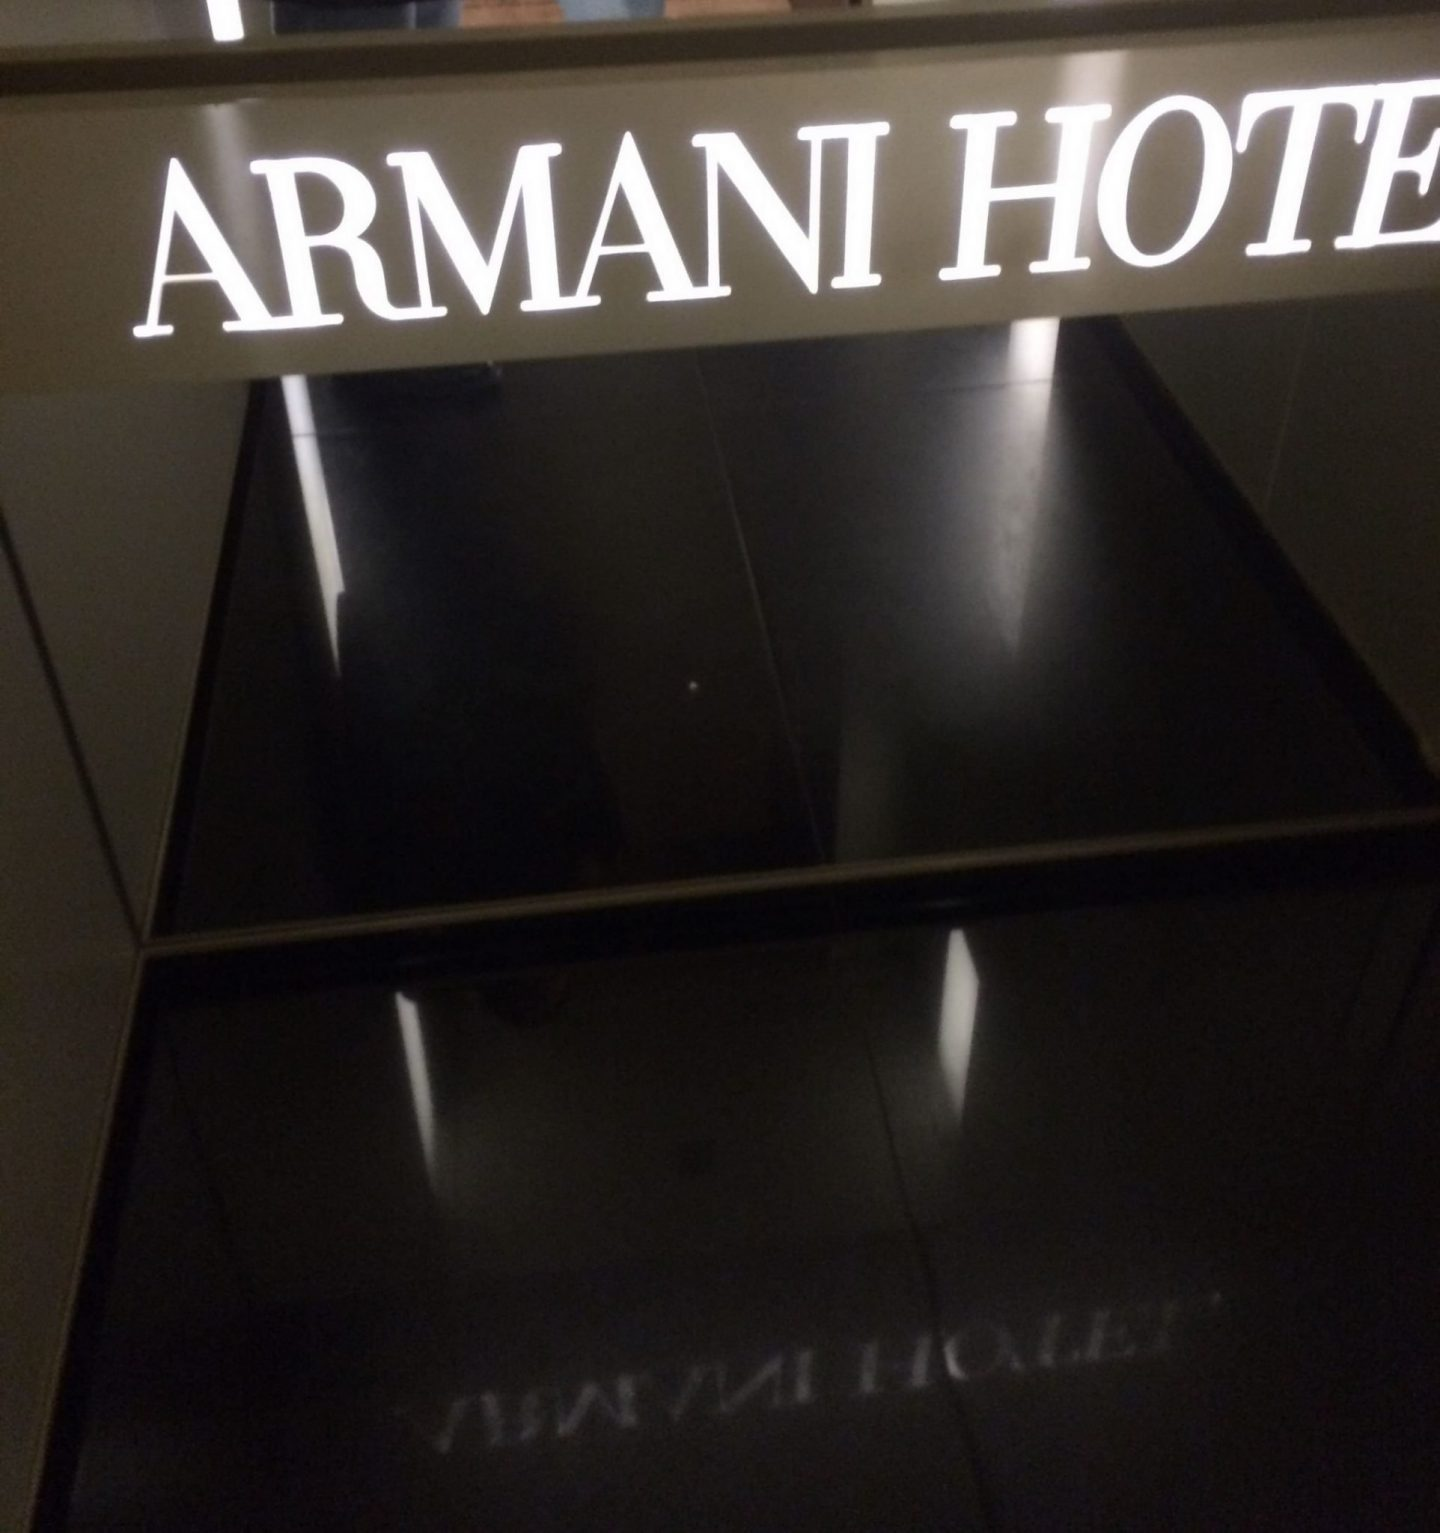 Armani Milan 5 1440x1533 - Armani Milan: a trendy drink